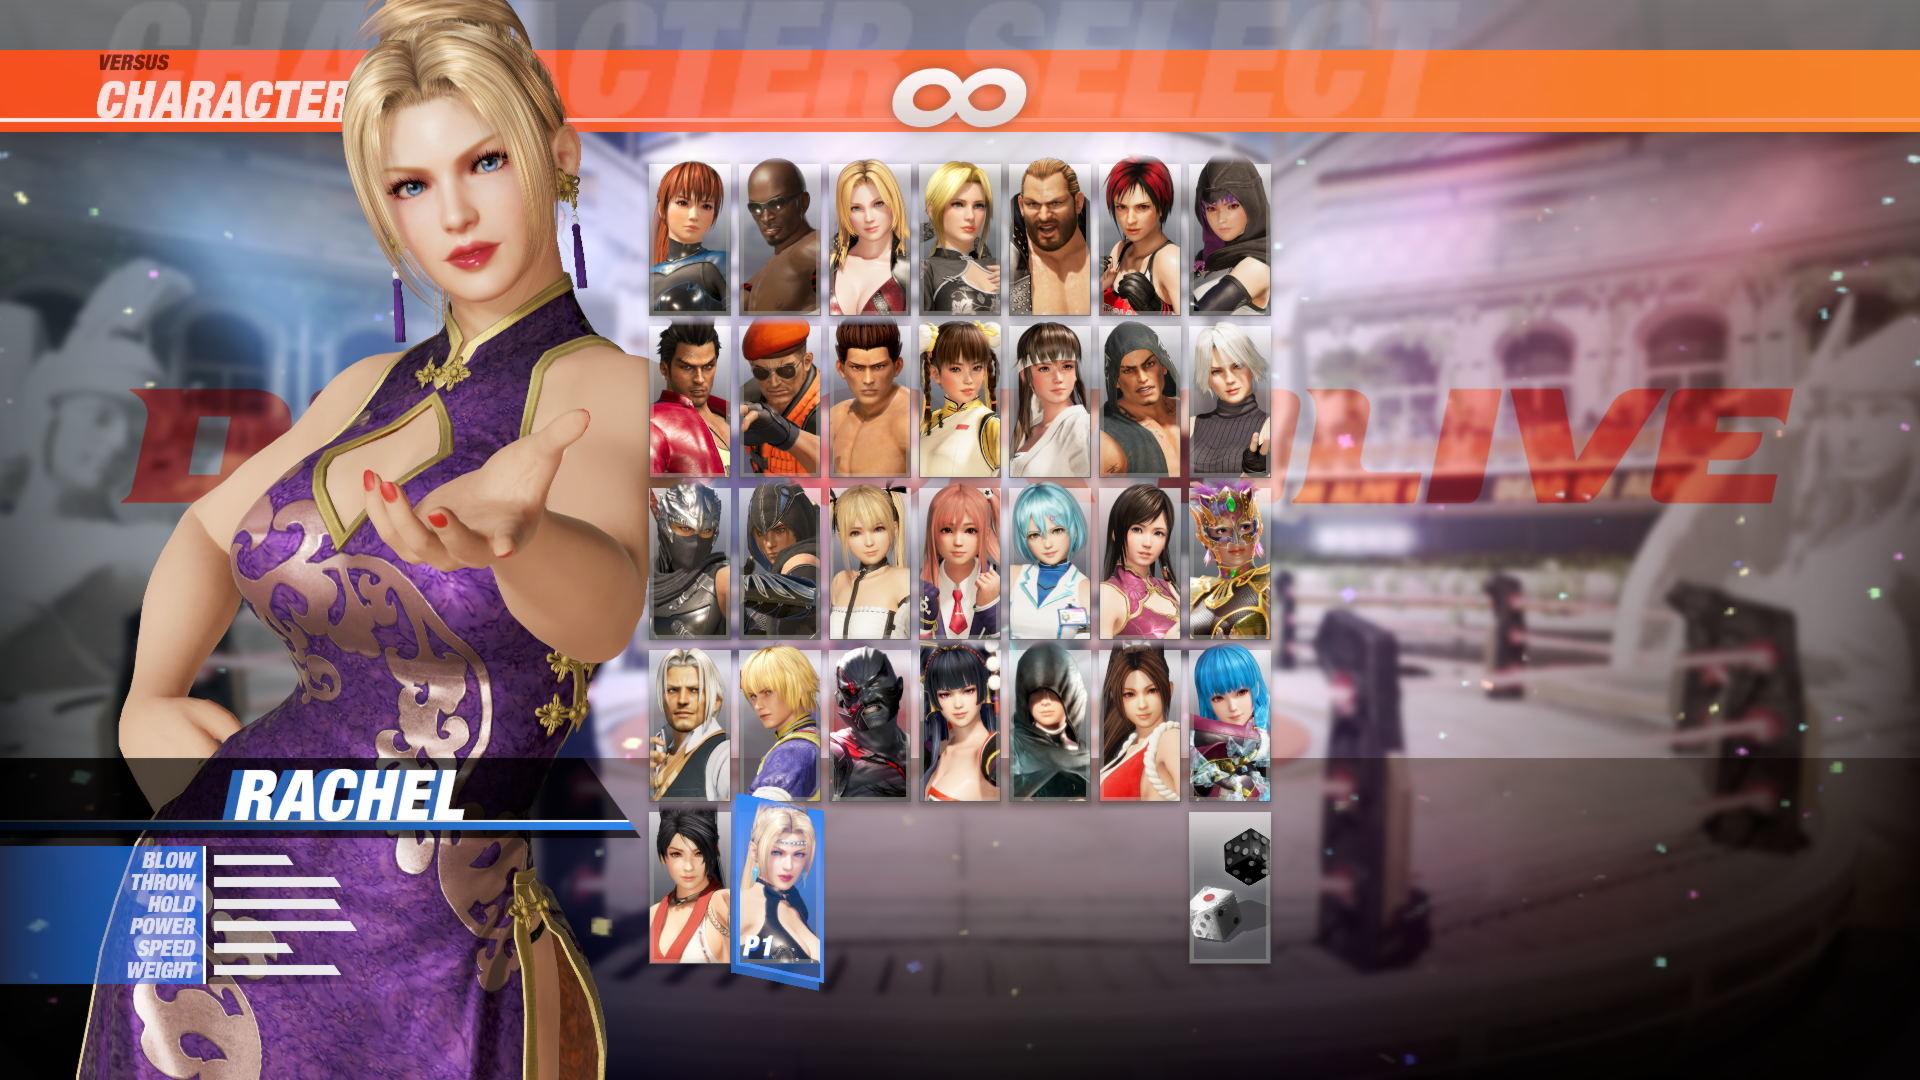 [Revival] DOA6 Alluring Mandarin Dress - Rachel screenshot